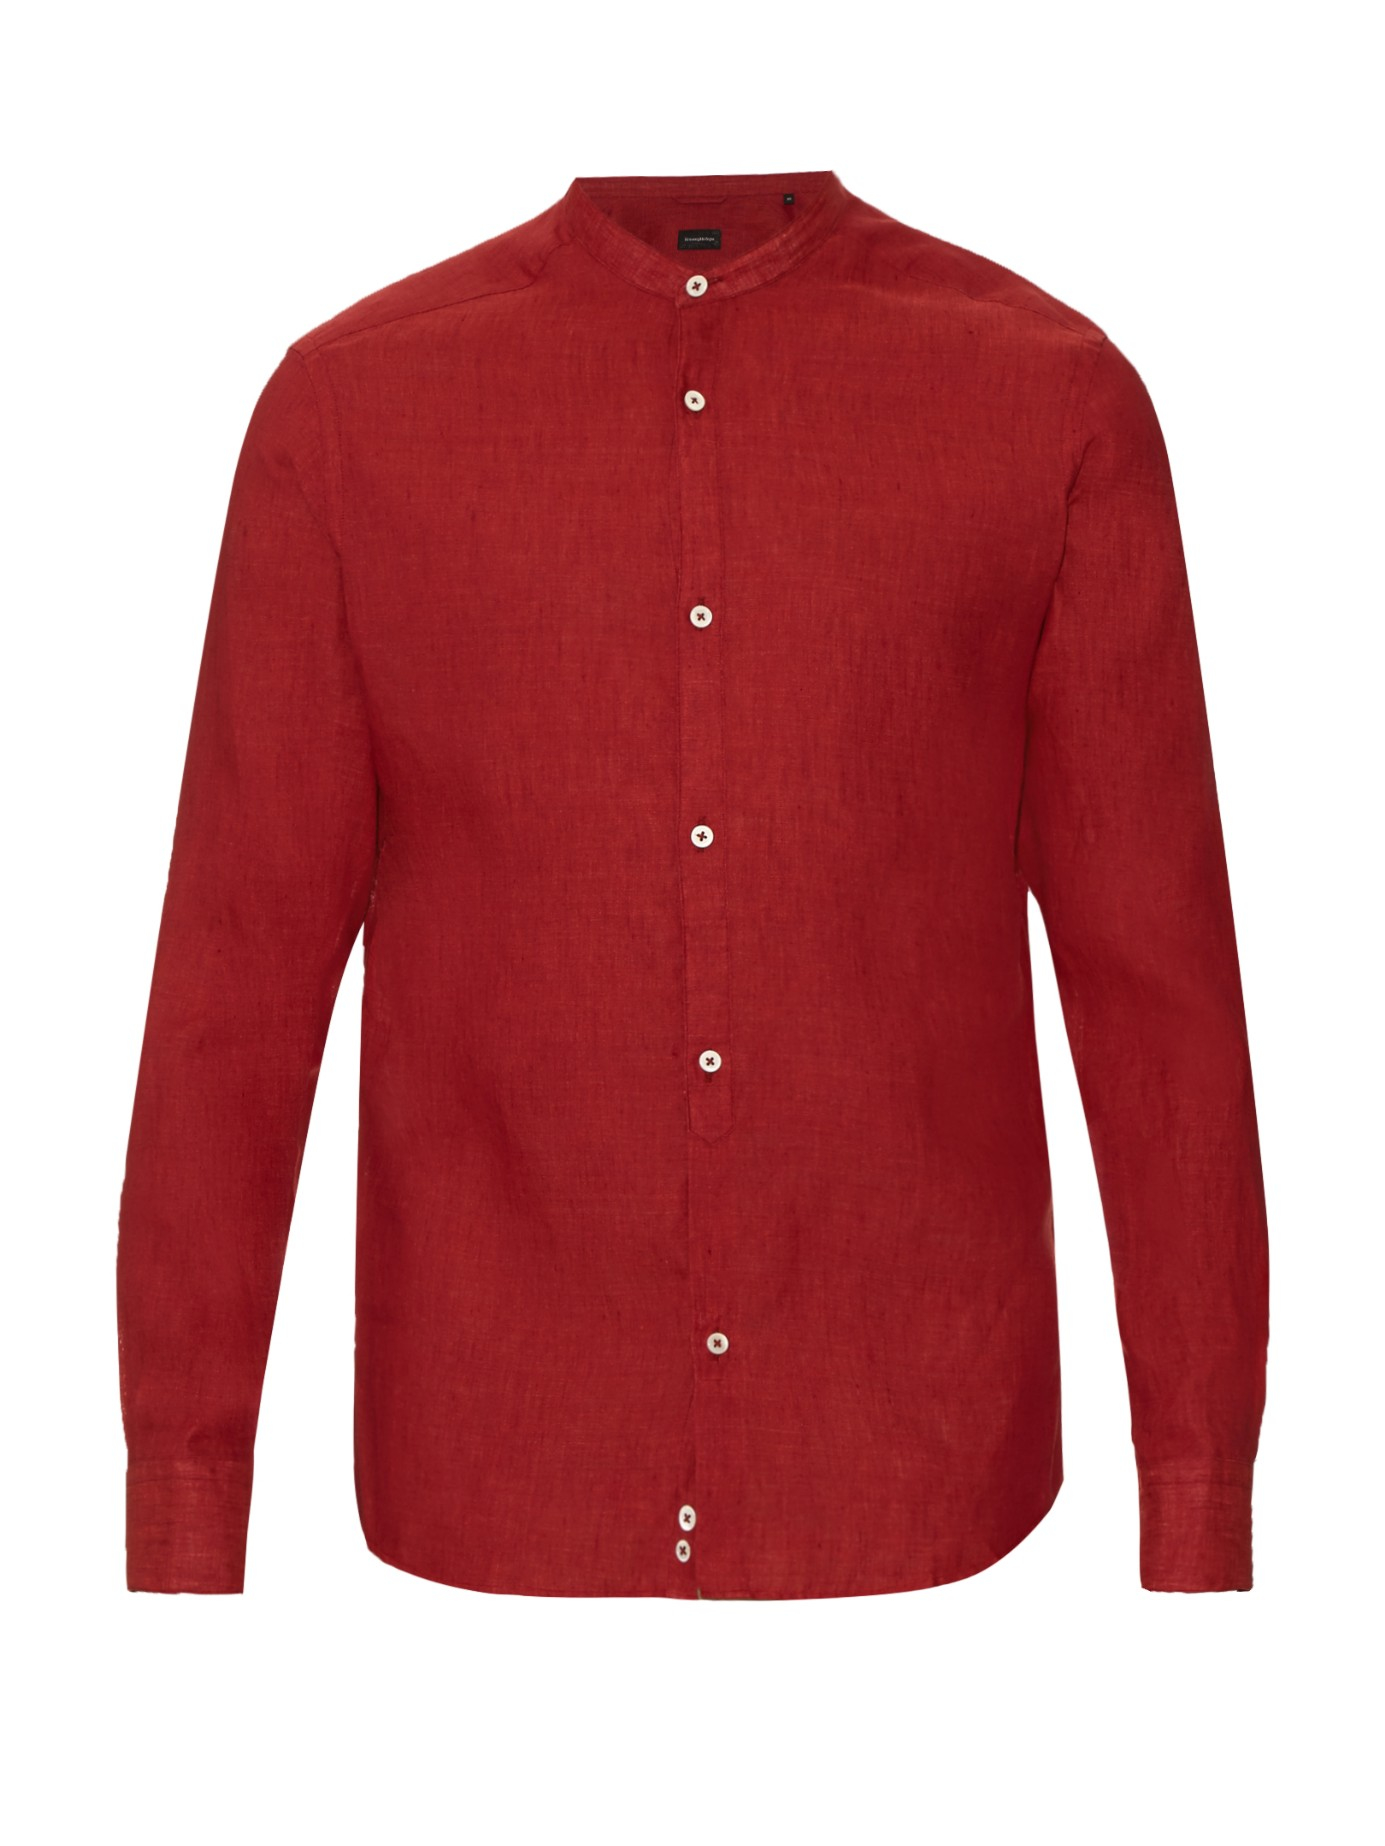 Ermenegildo zegna collarless linen shirt in red for men lyst for Collarless shirts for men